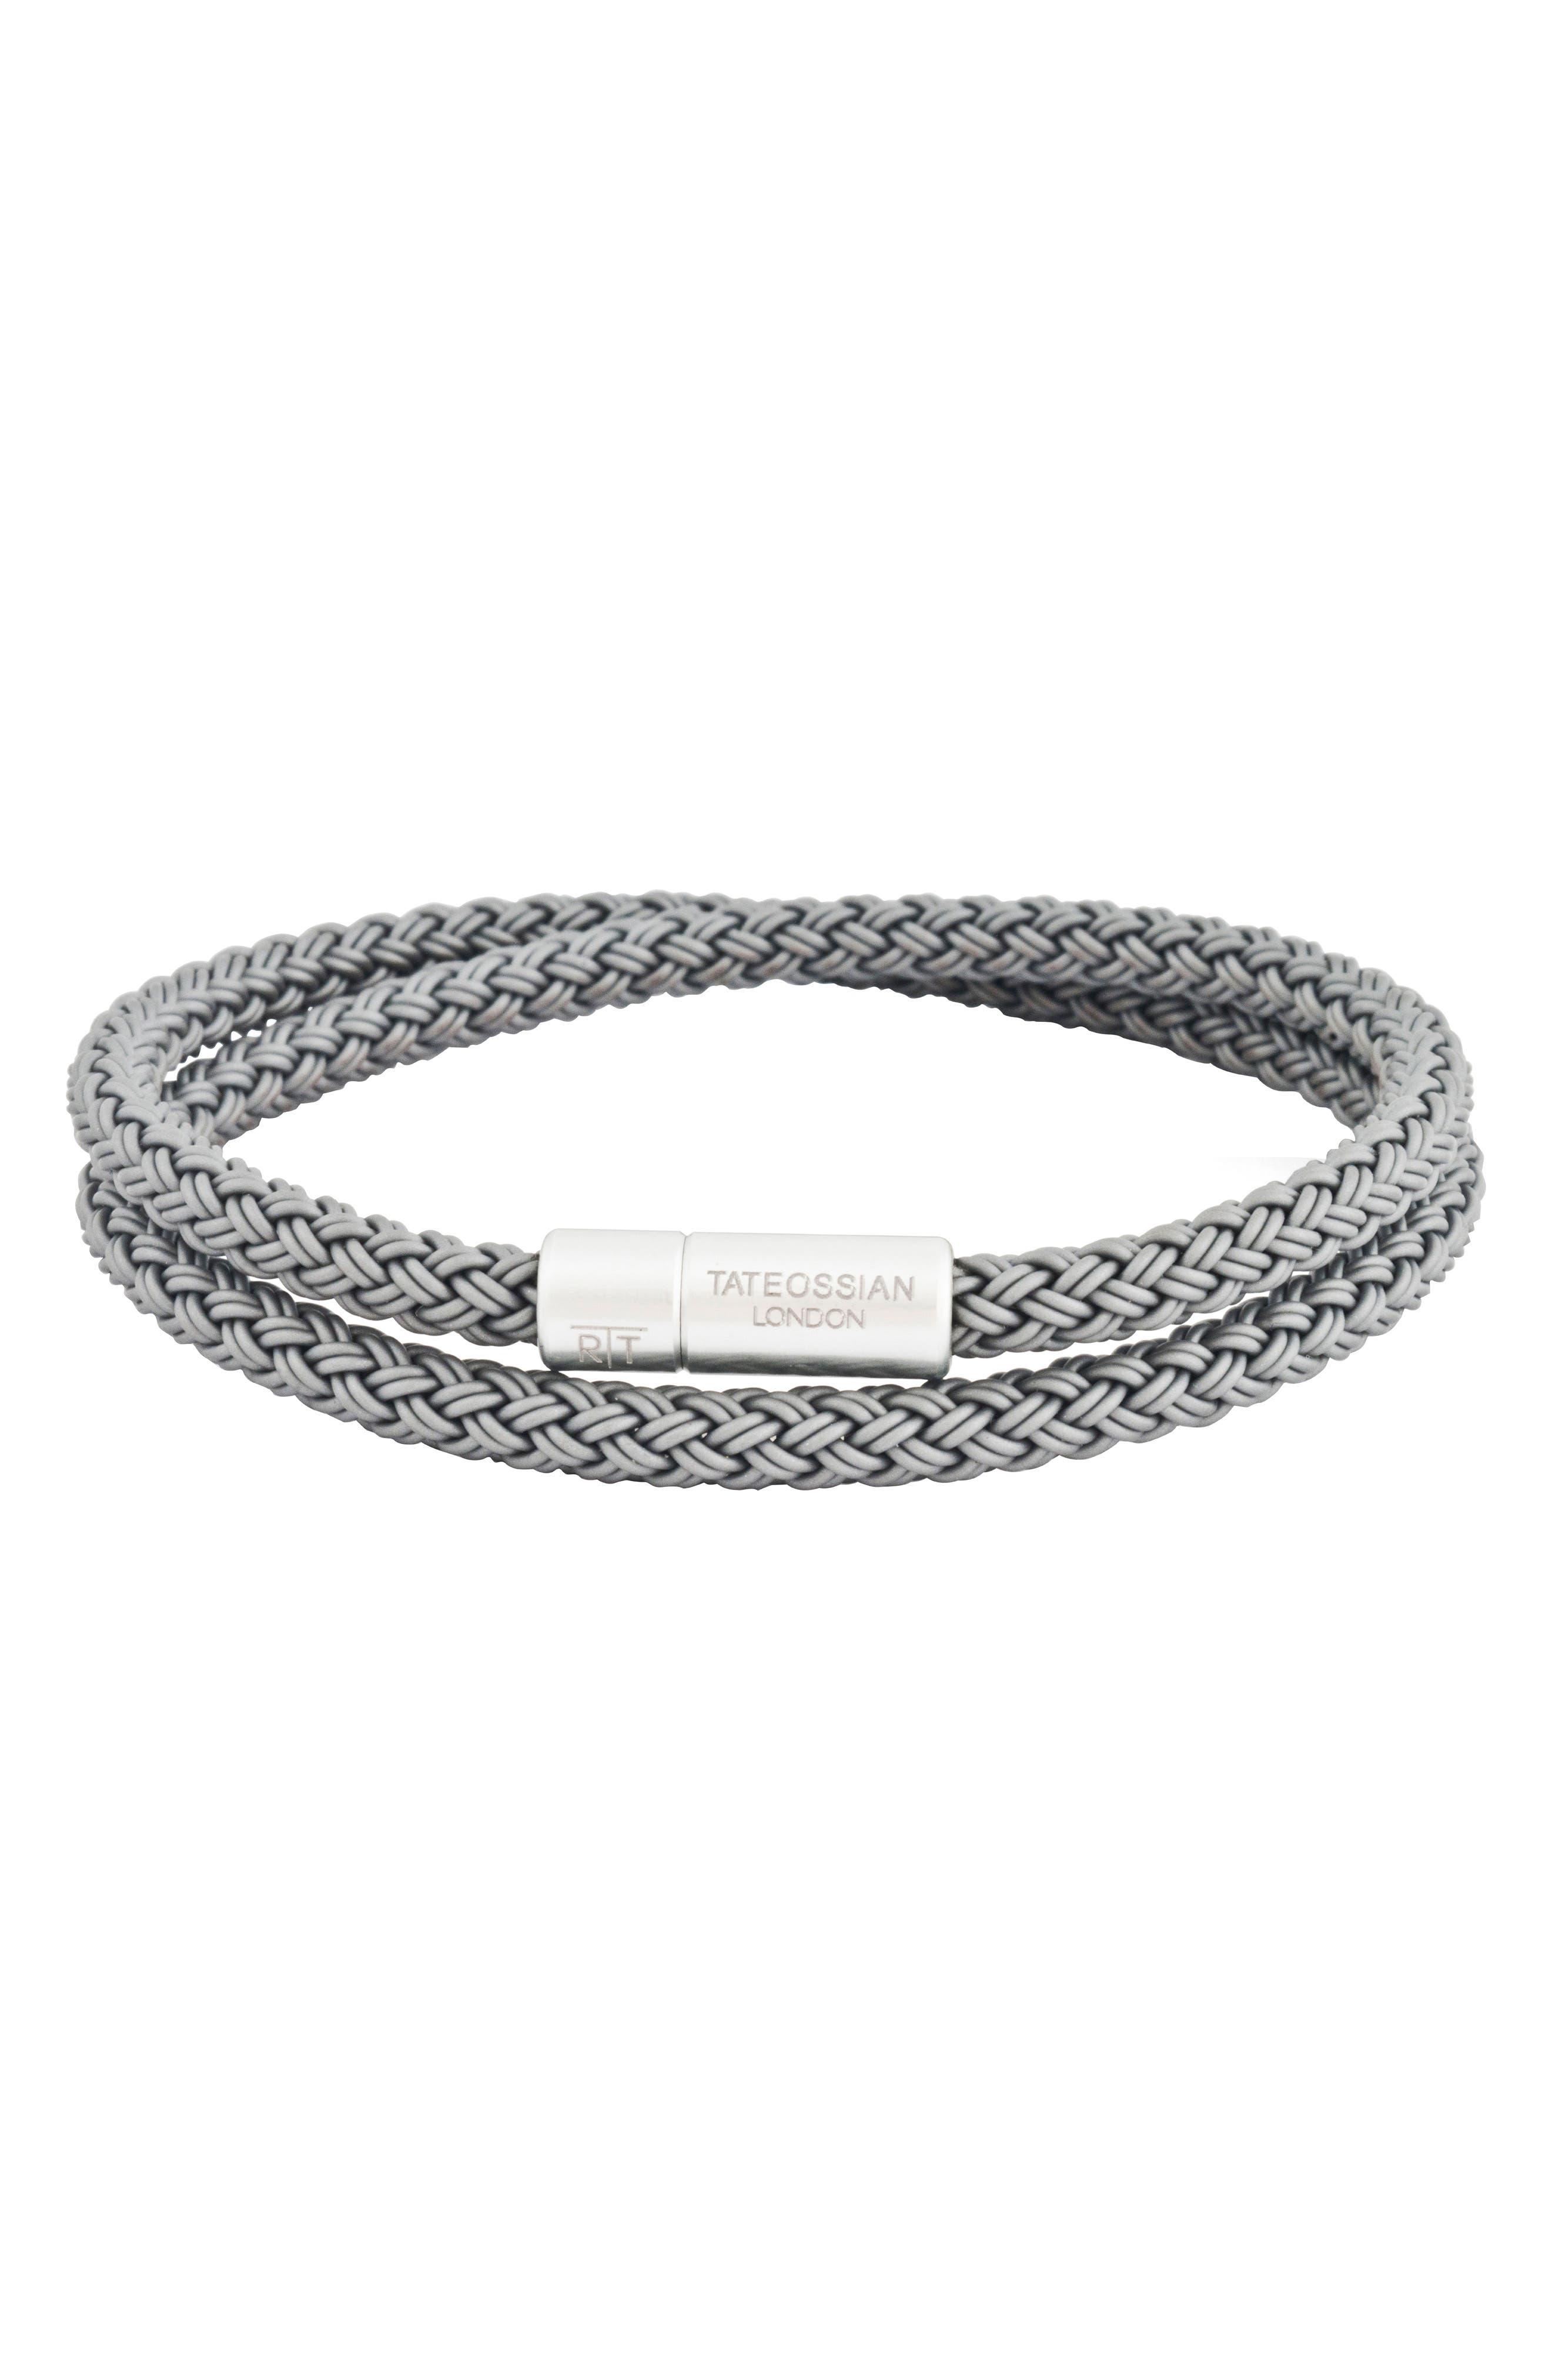 TATEOSSIAN Men'S Cable Double-Wrap Bracelet, Gray in Grey